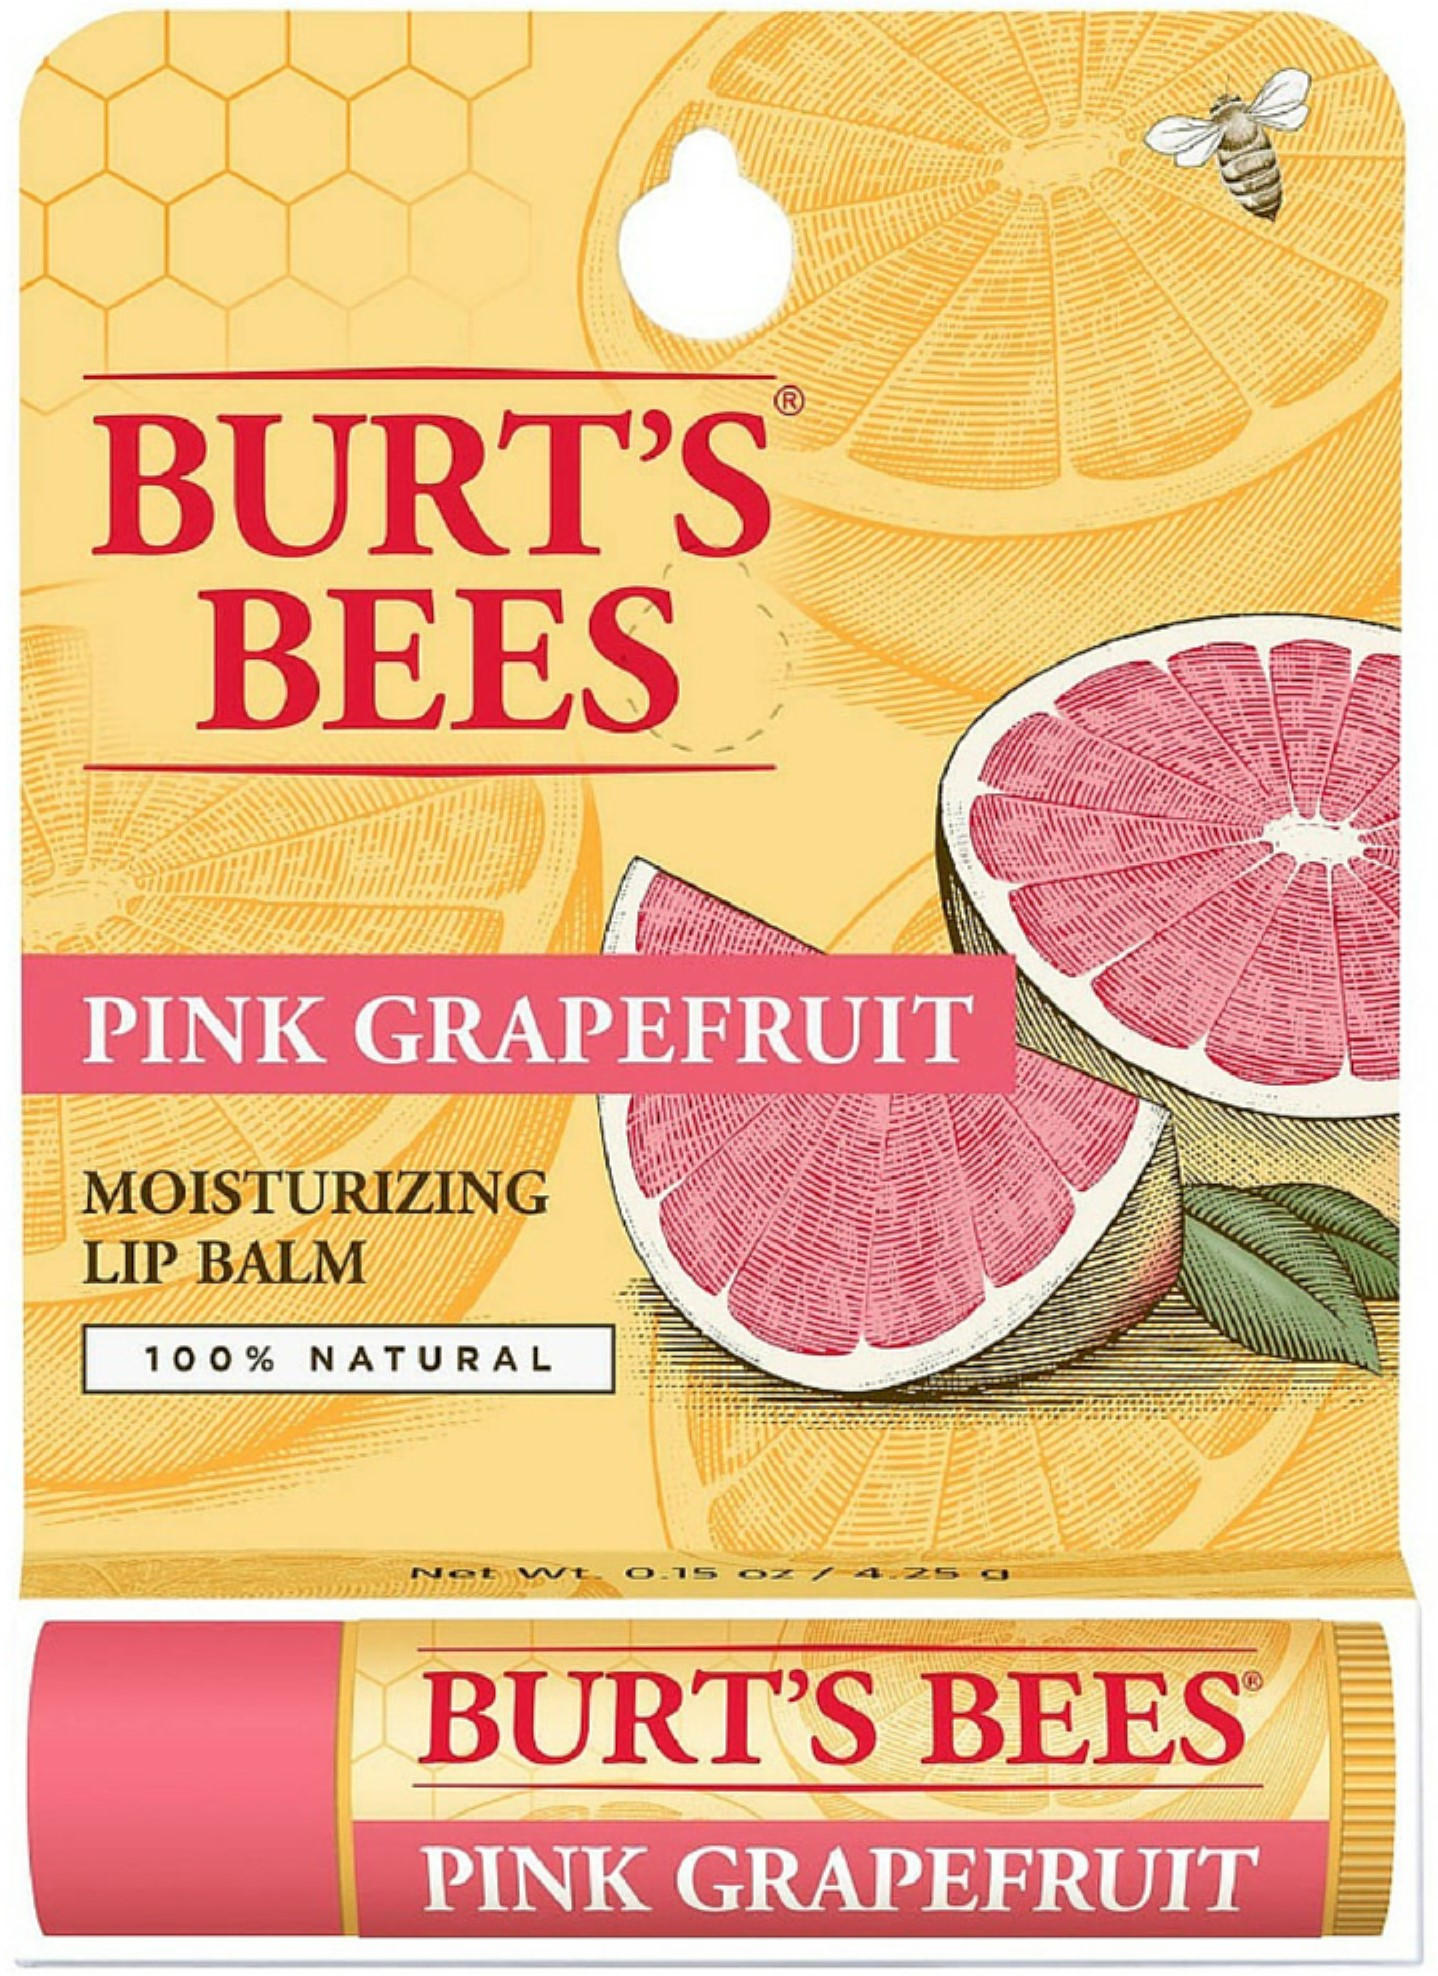 4 Pack Burt's Bees Pink Grapefruit, Moisturizing Lip Balm 0.15 oz by